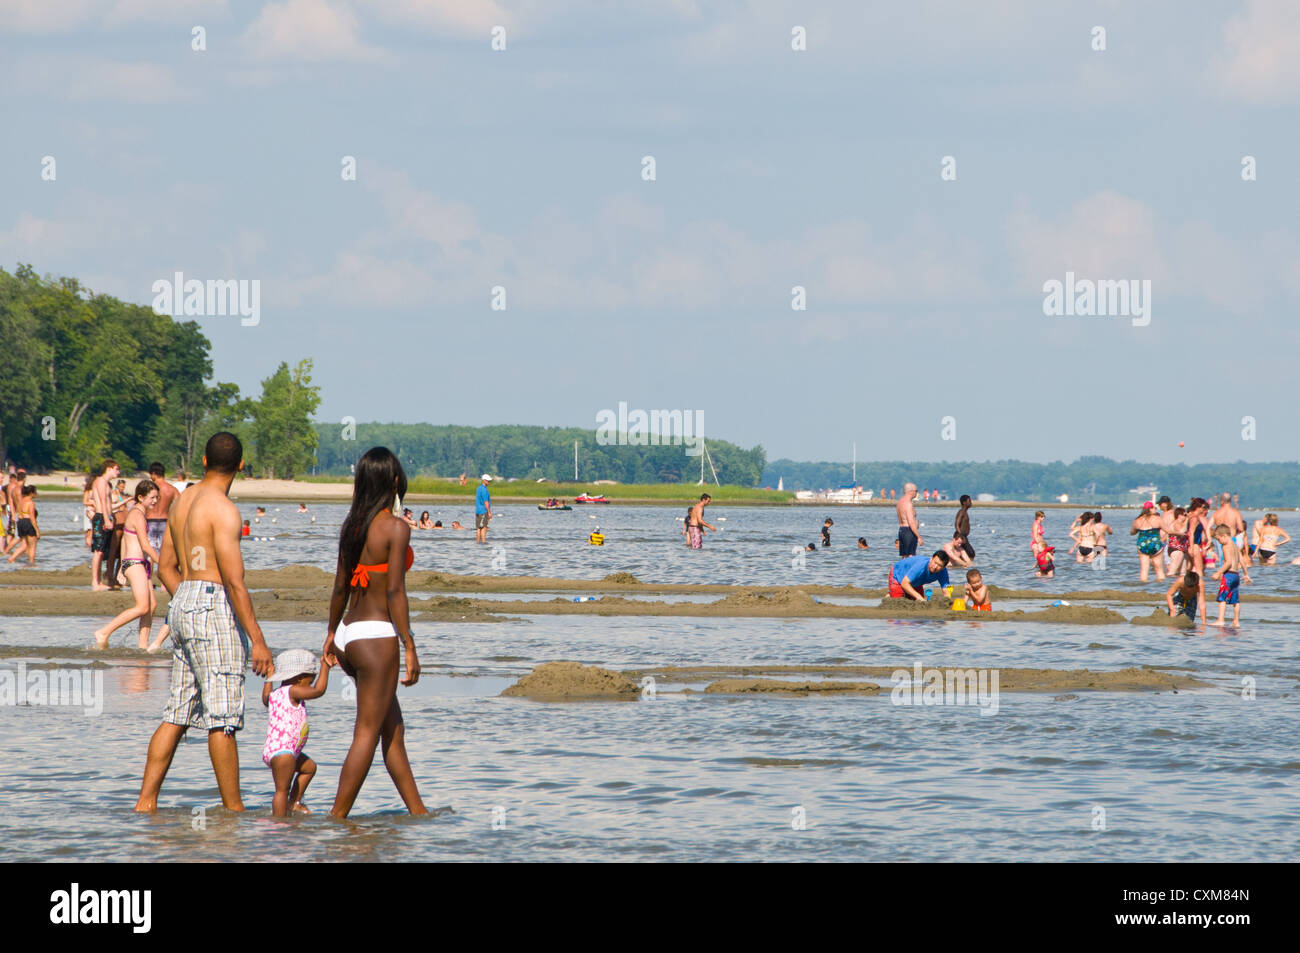 Familia multicultural en la playa playa de Oka, Monteregie Quebec Canada Imagen De Stock